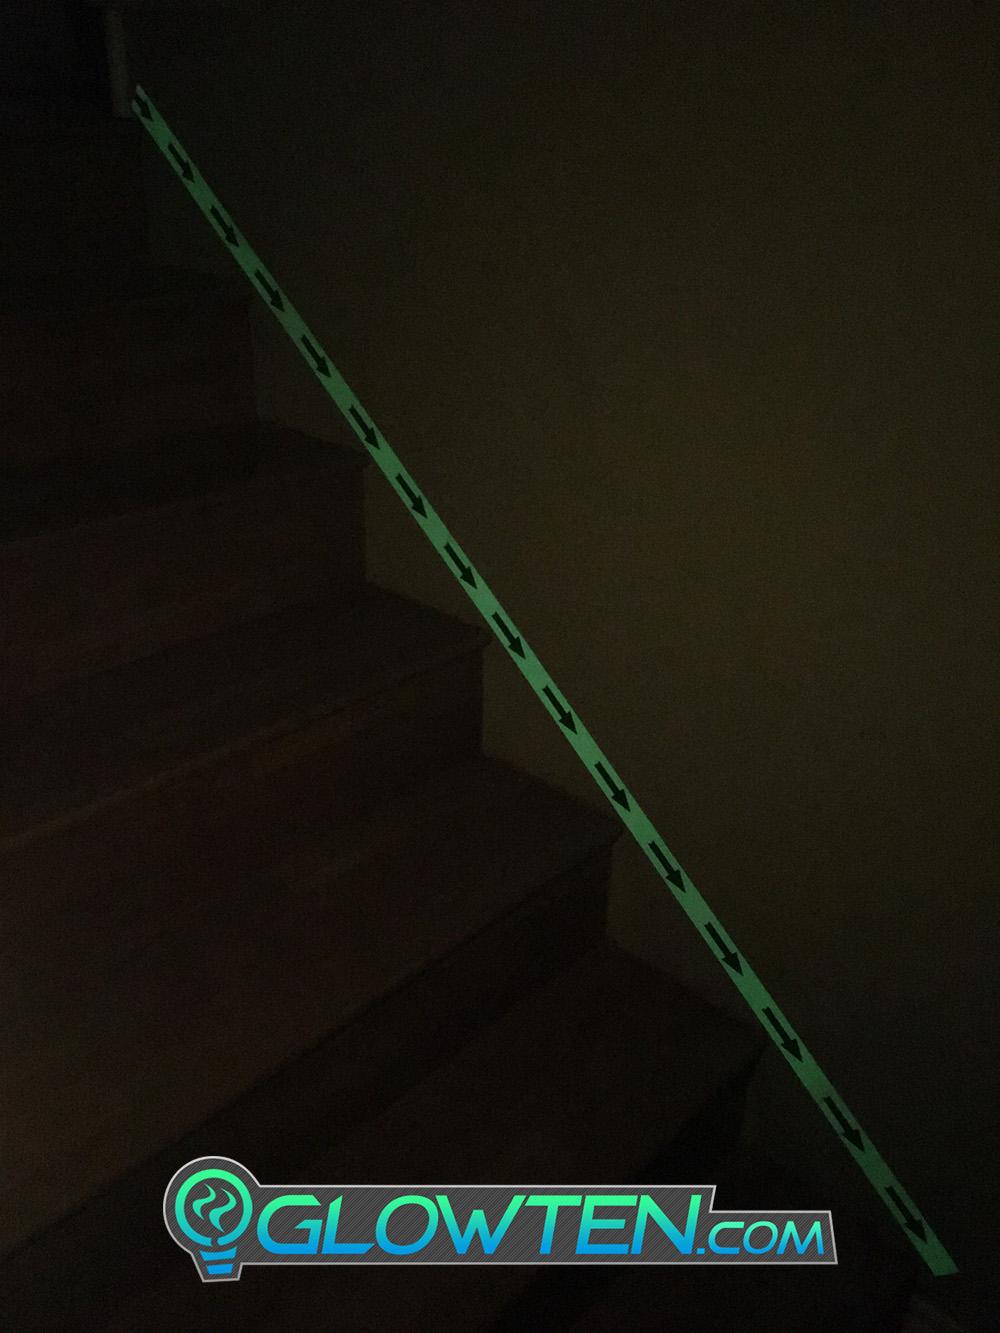 GLOWTEN.com - ARROW POINT TAPE Glow in the Dark Green Single Direction Sign All Purpose Tape Roll Lite Green glow in the dark arrow safety sign pic 8